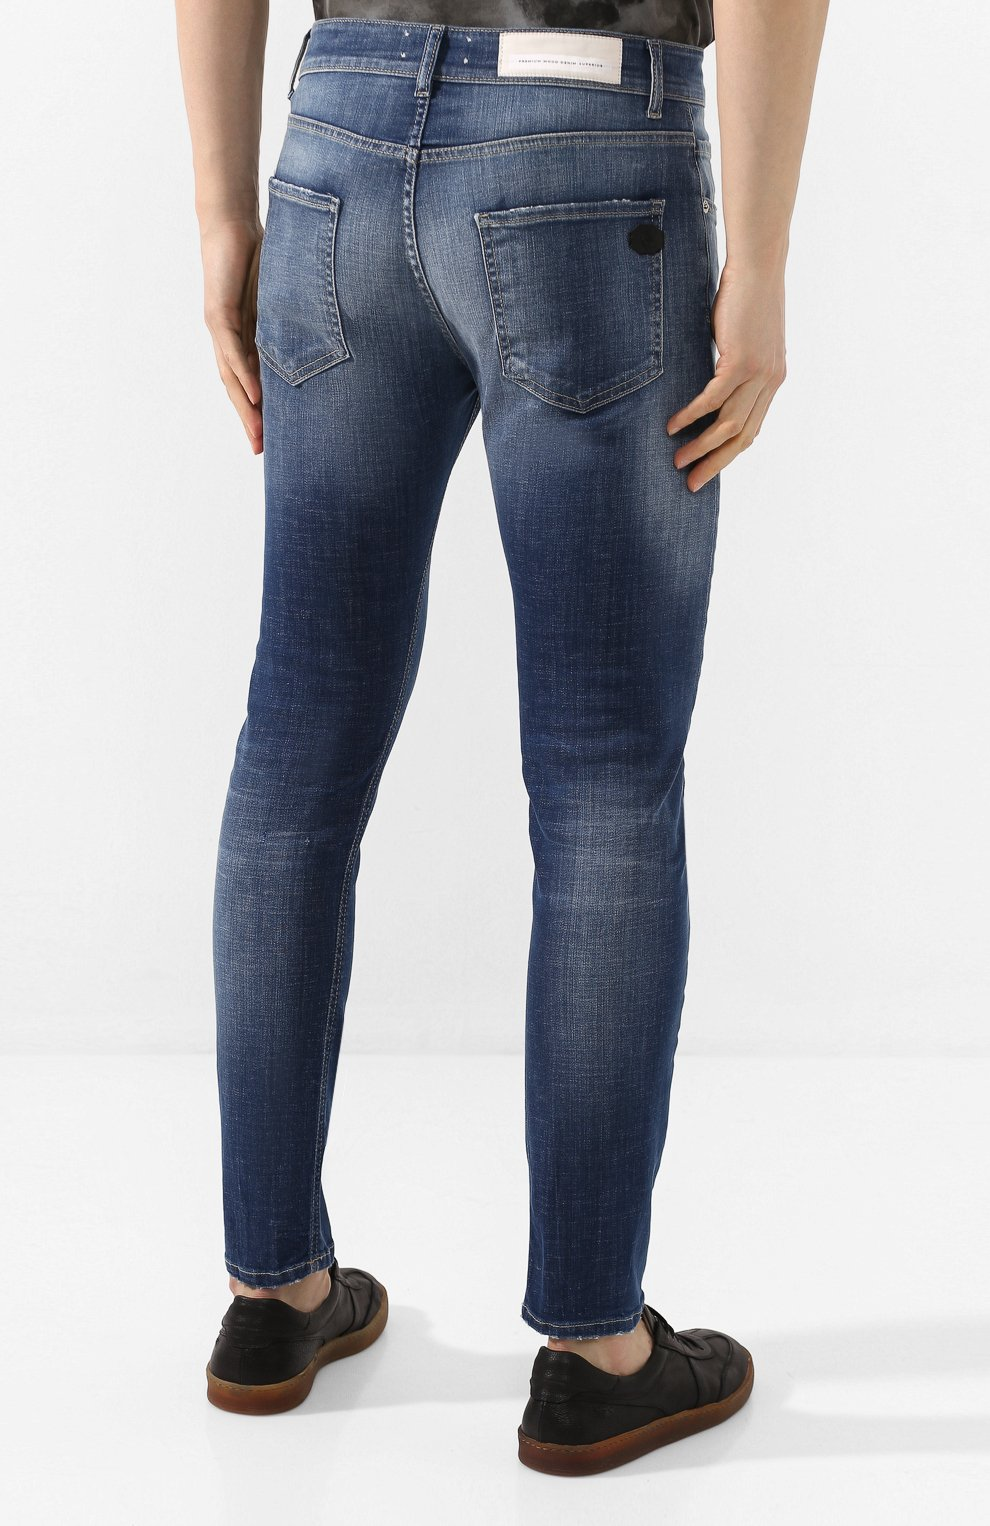 Мужские джинсы PREMIUM MOOD DENIM SUPERIOR синего цвета, арт. S20 0352740020E/BARRET | Фото 4